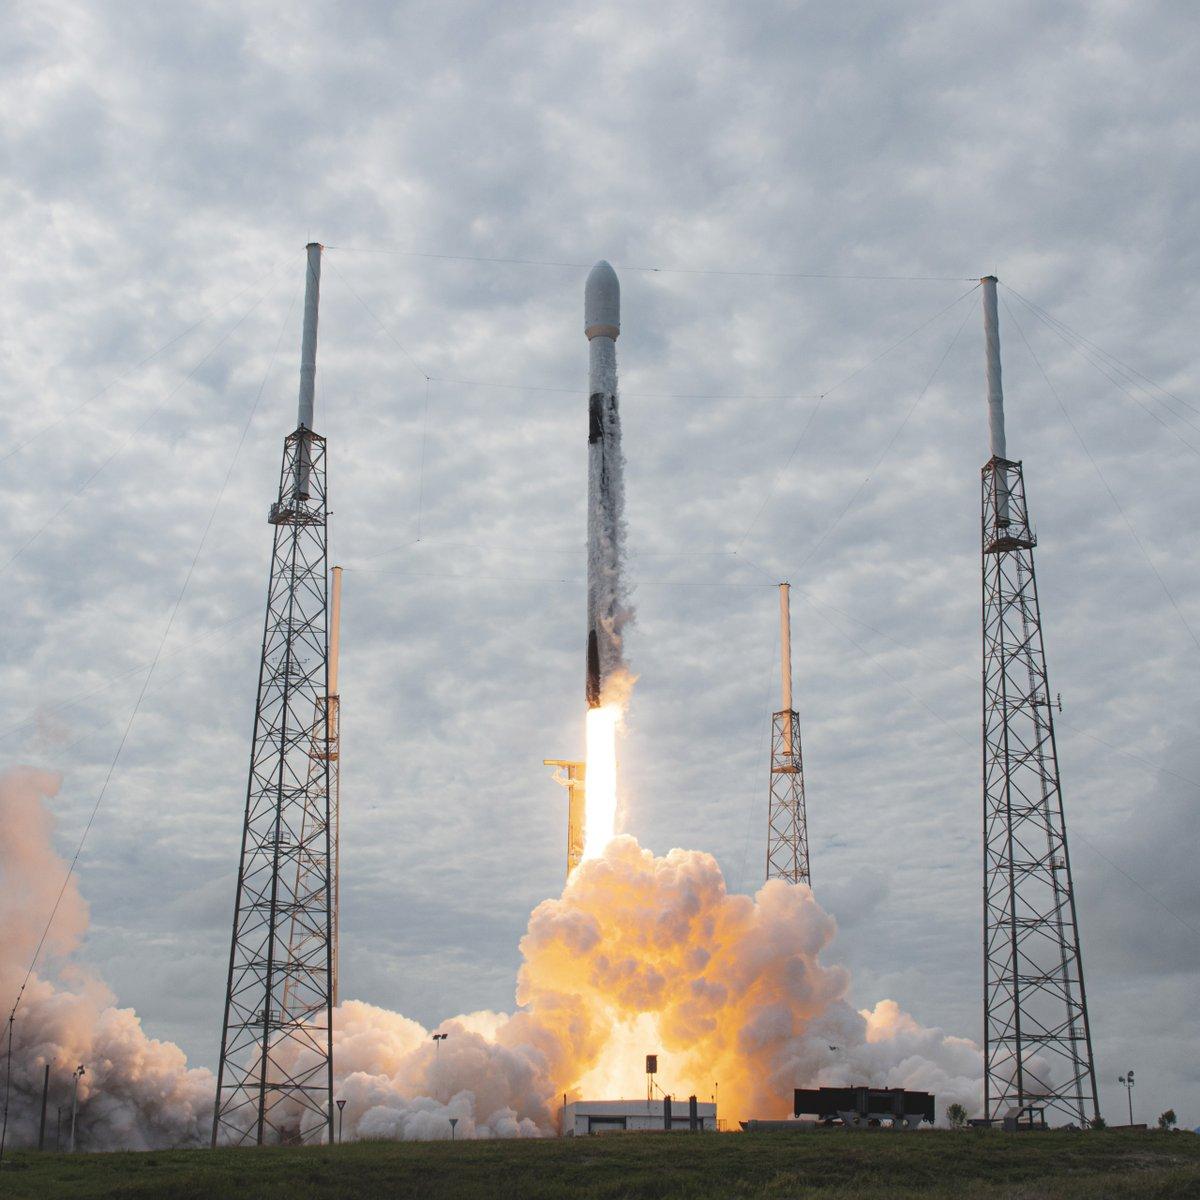 Falcon 9 launches SpaceX's 100th successful flight →